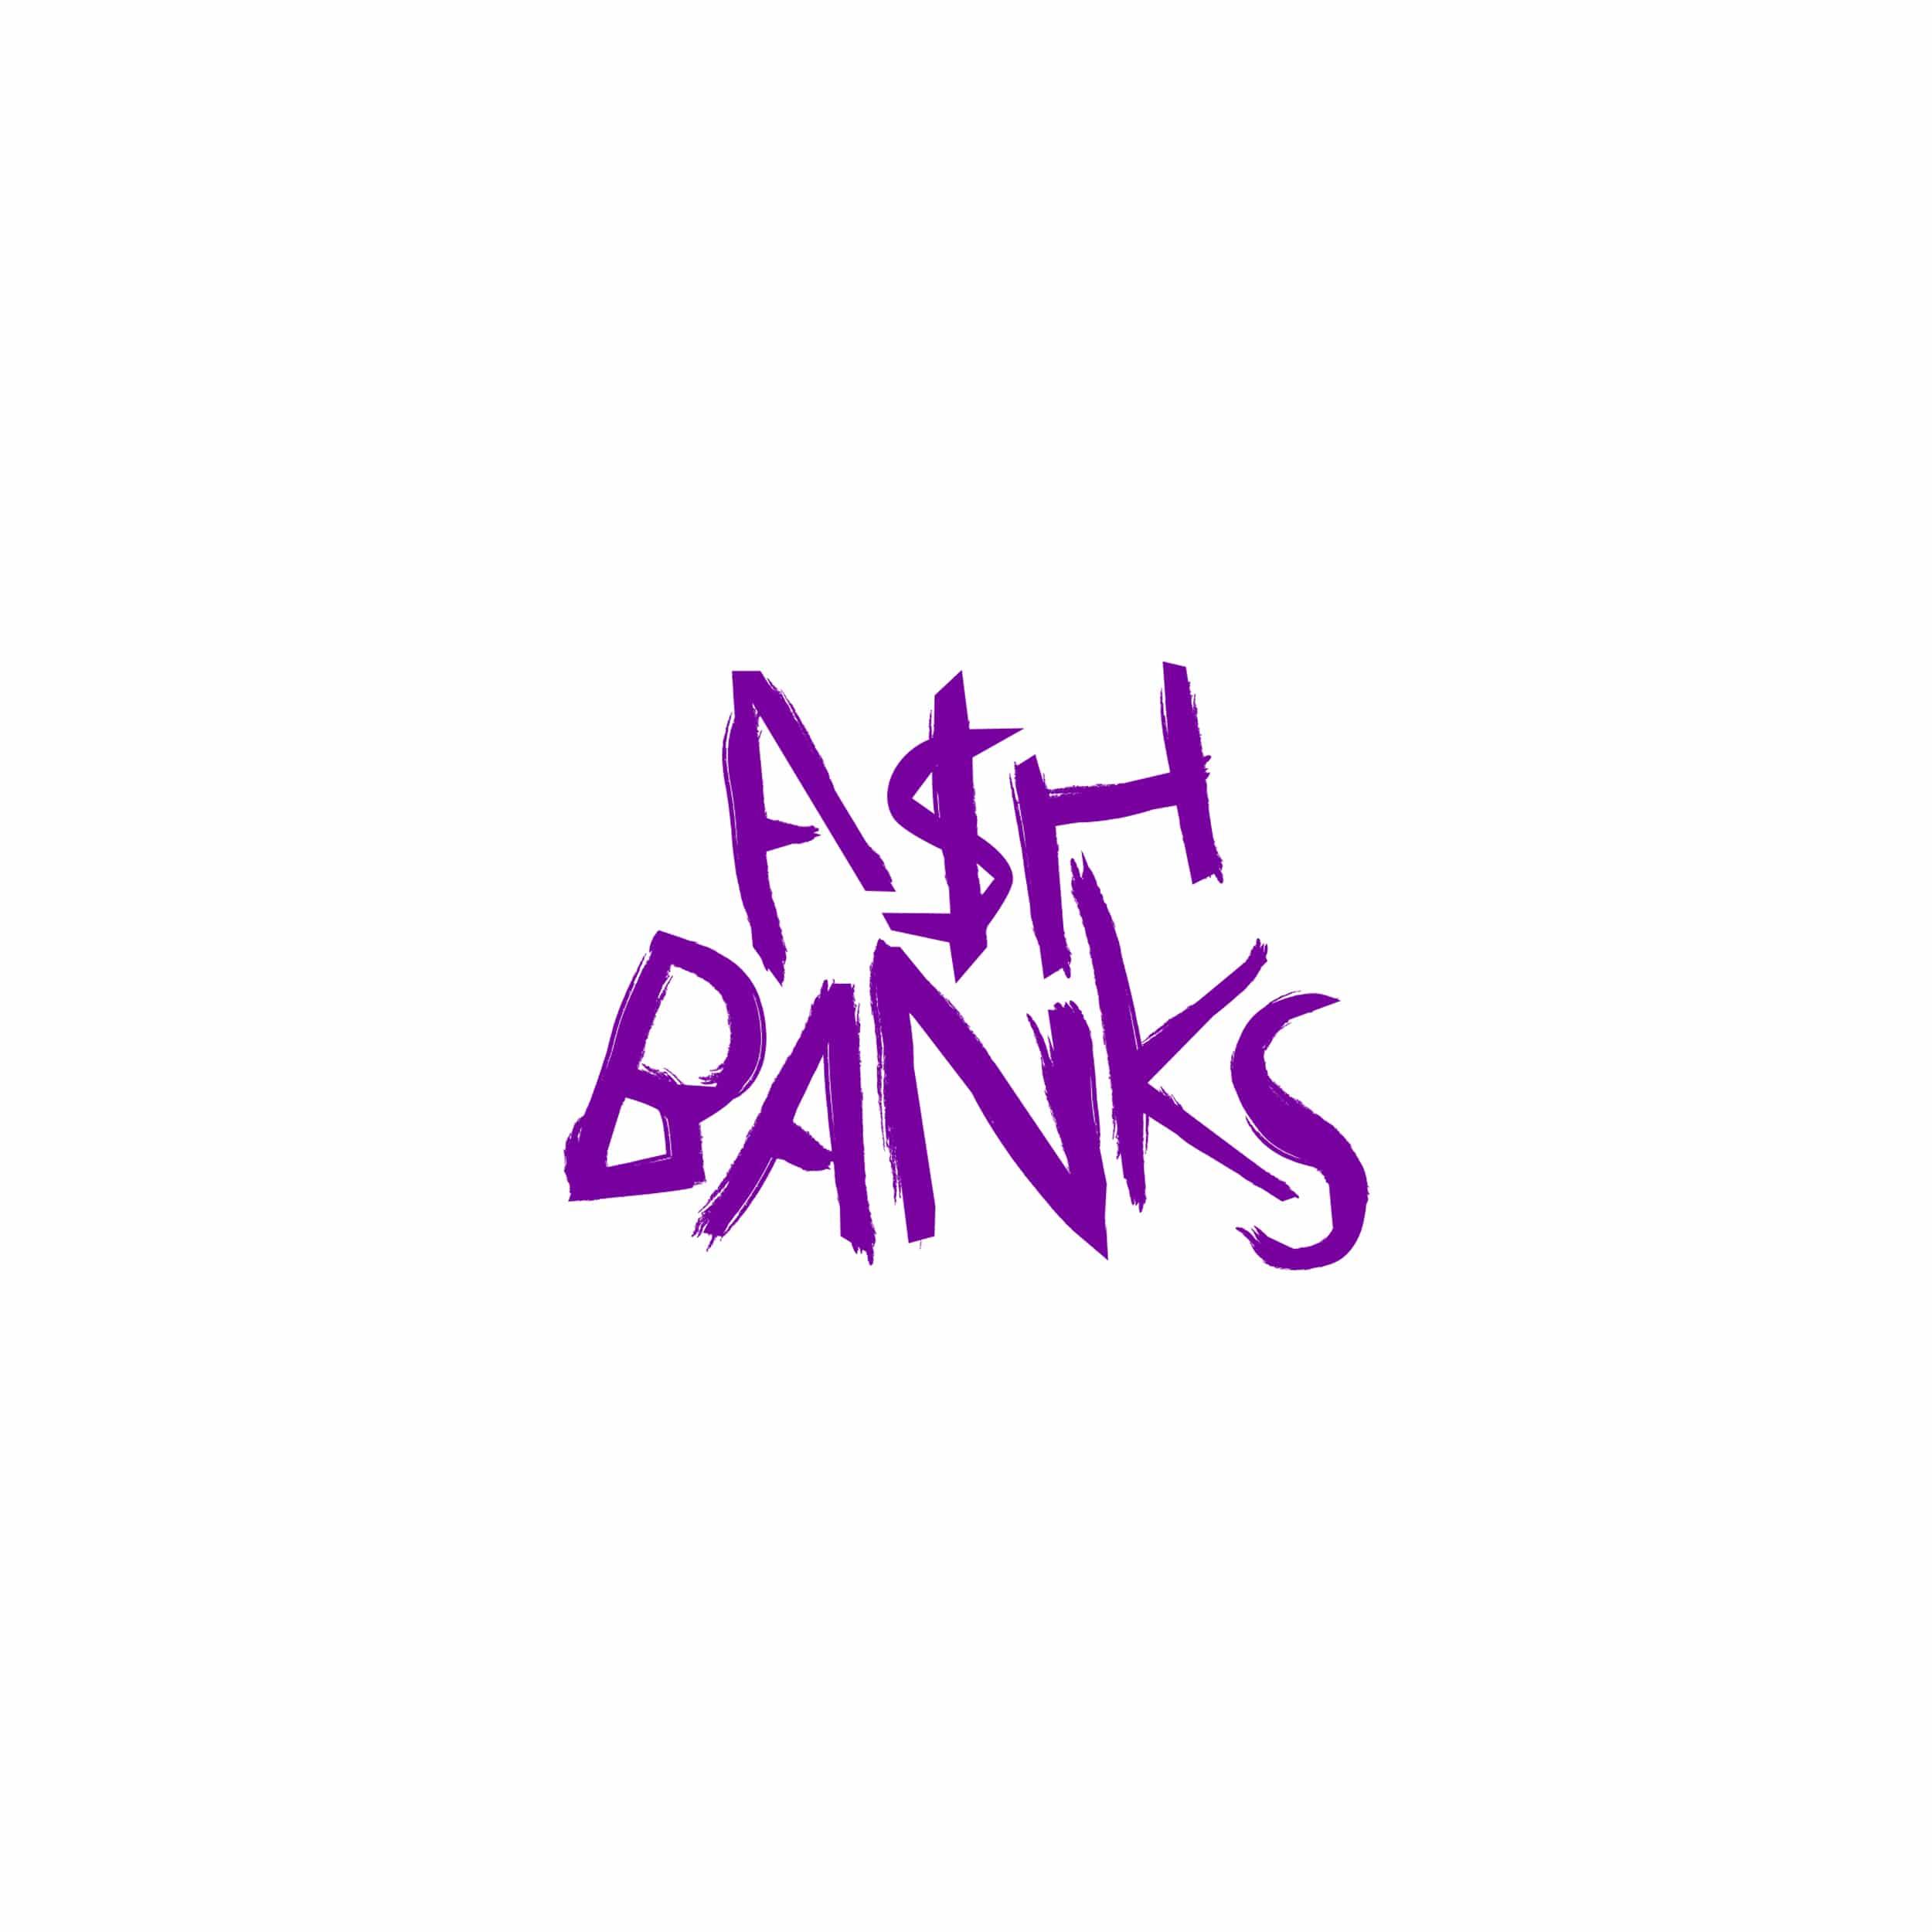 karla-moy-ash-banks